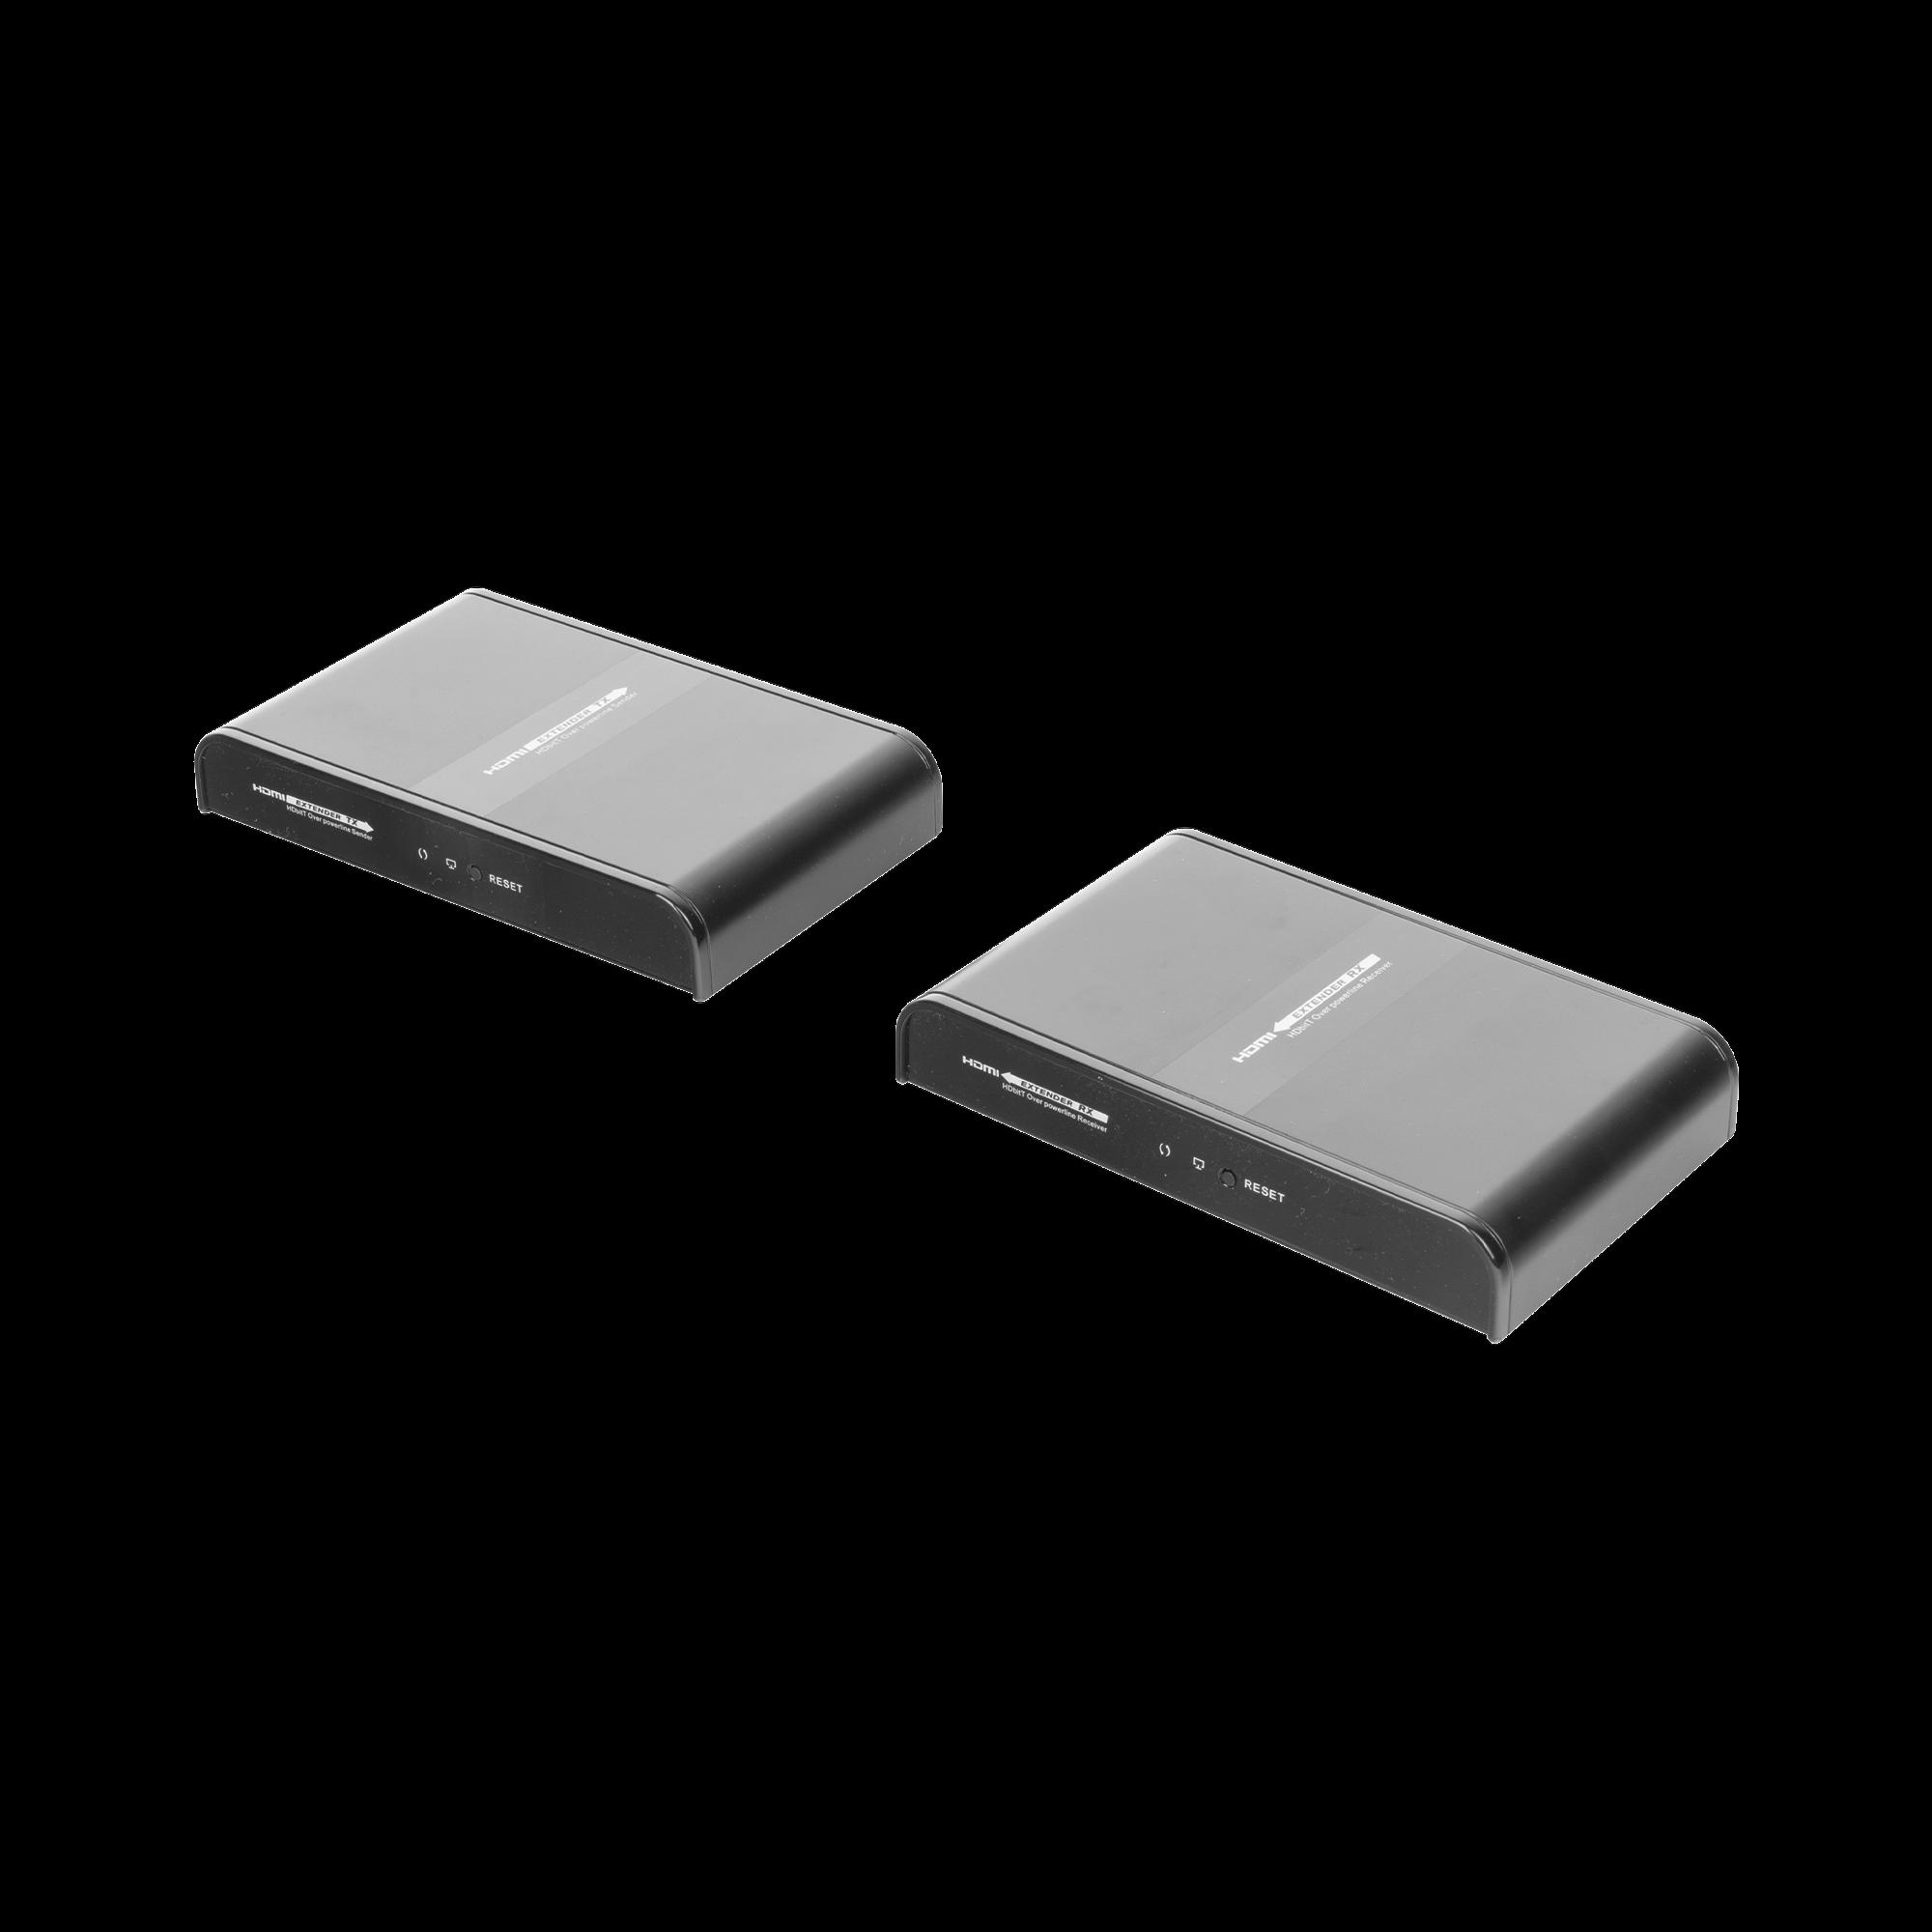 Kit extensor HDMI sobre Powerline con loop HDbitT, protocolo HDbitT, compatible con HDCP. Distancia de transmision hasta 300 metros.